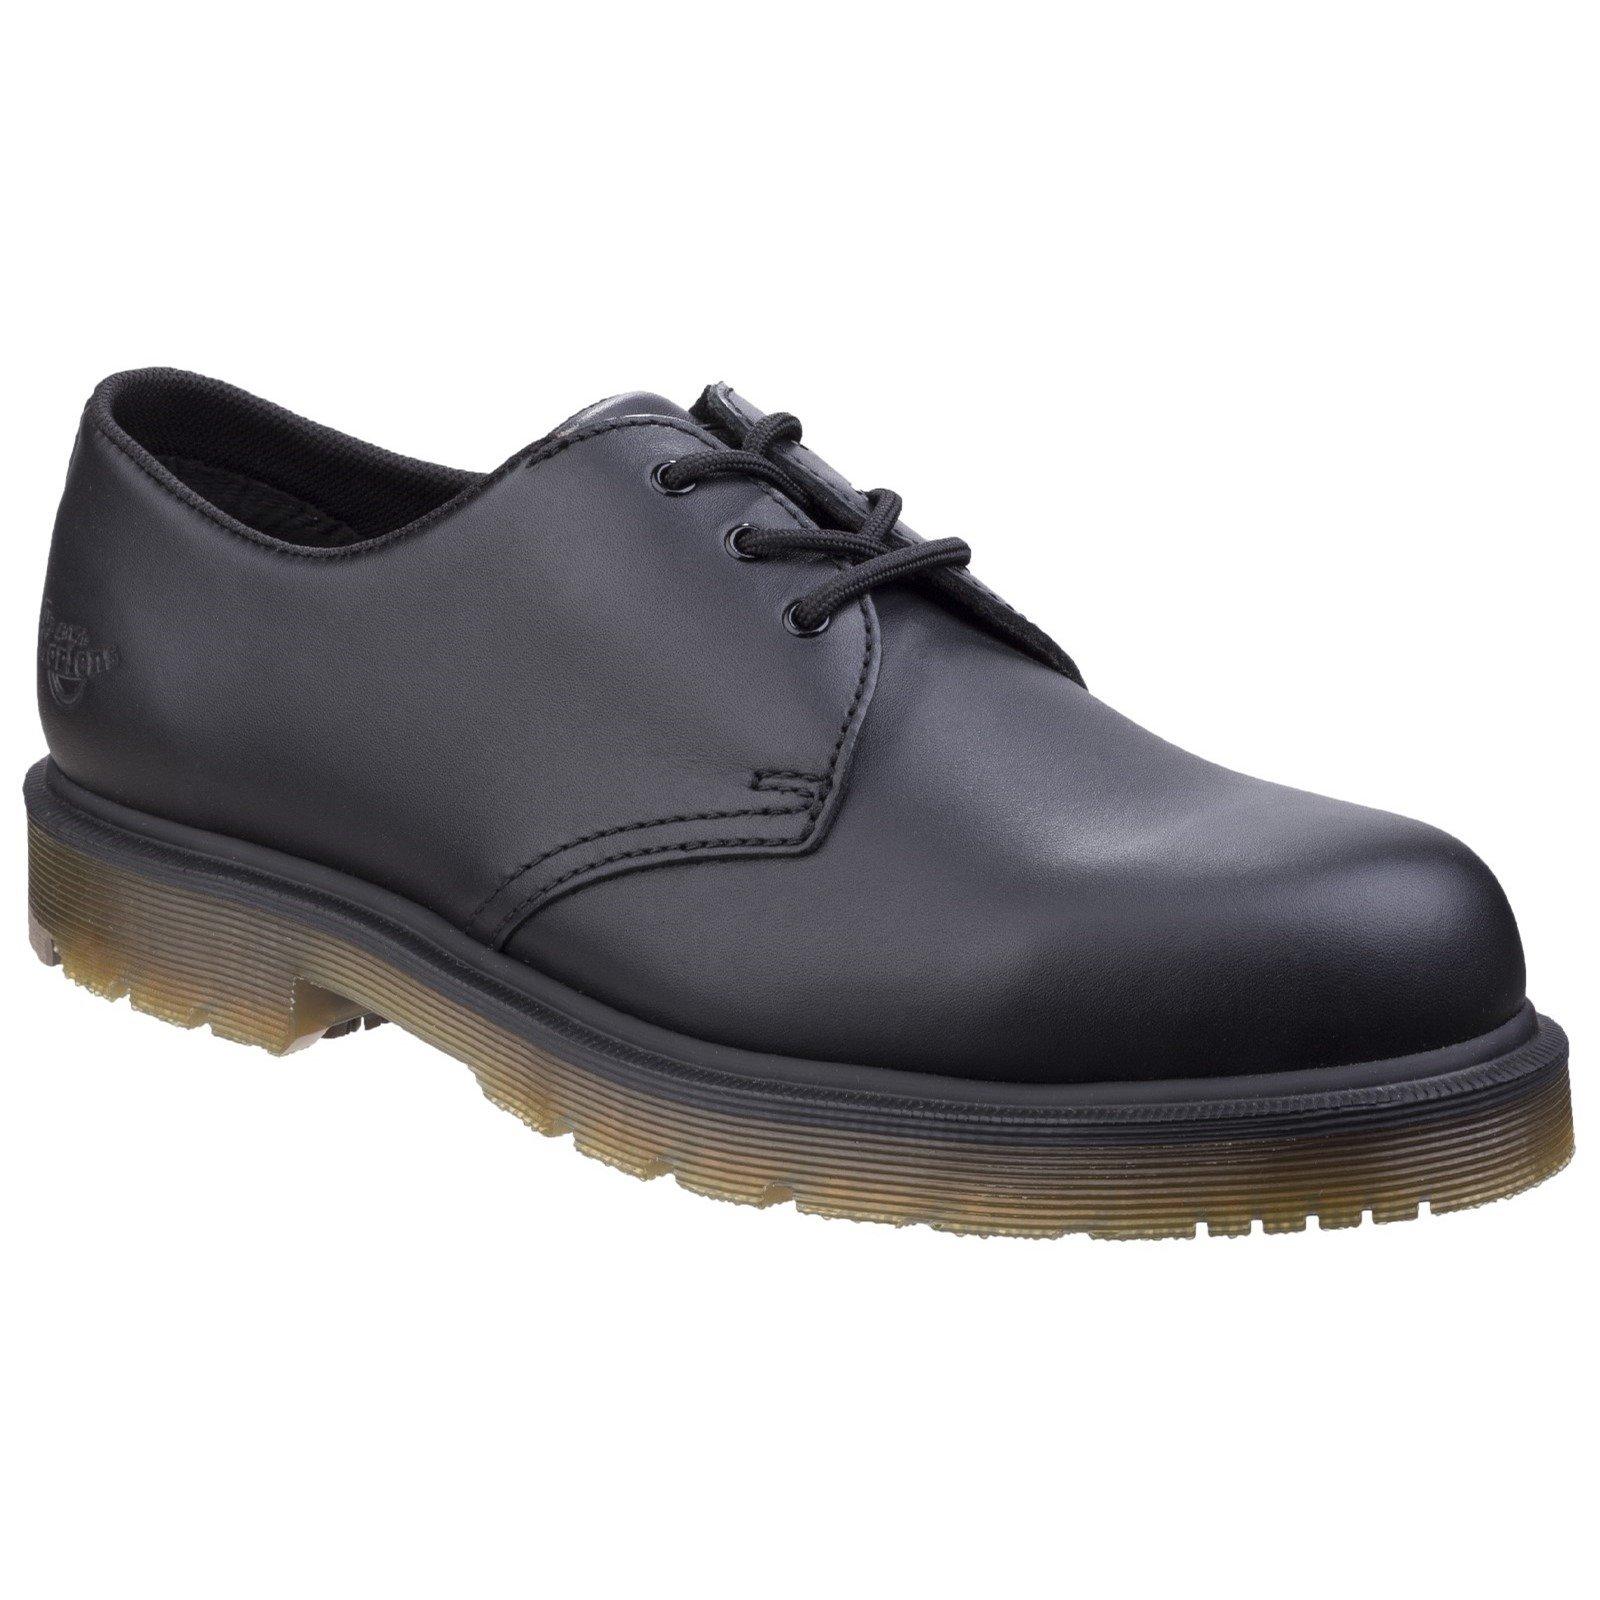 Dr Martens Men's Arlington NS Derby Shoe Black 26781 - Black Industrial Full Grain 9